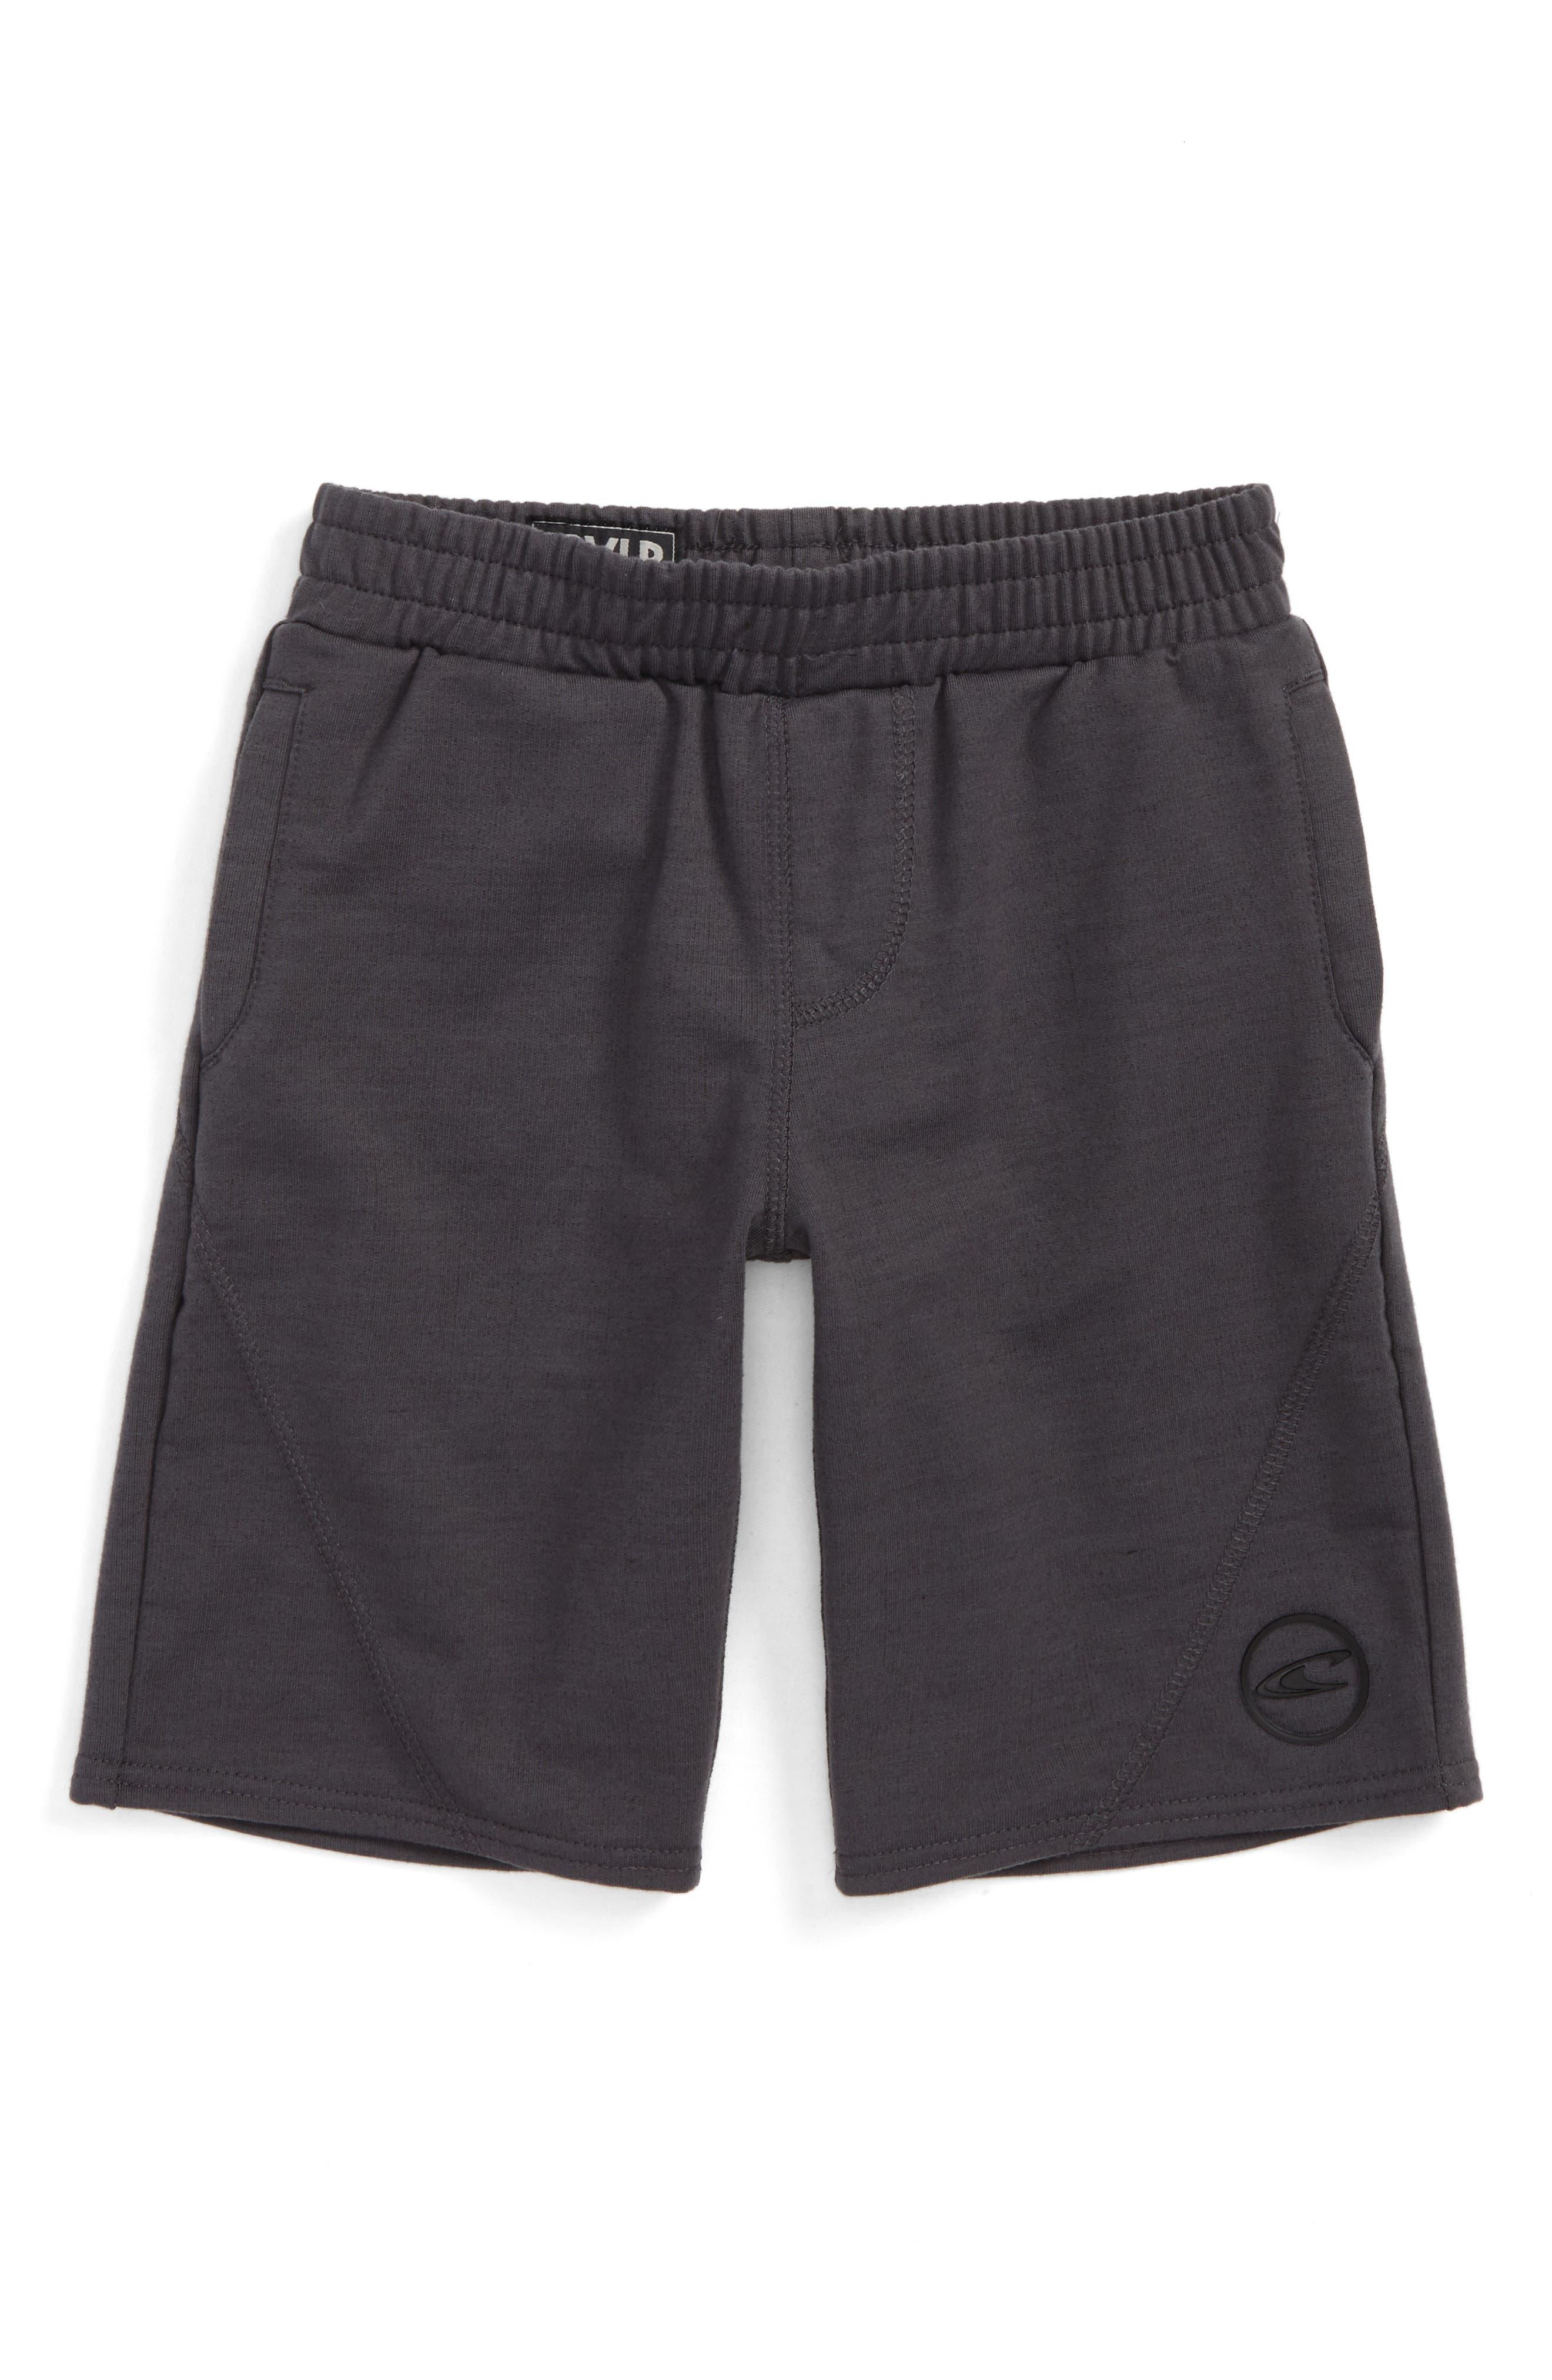 Traveler Knit Shorts,                         Main,                         color, Asphalt